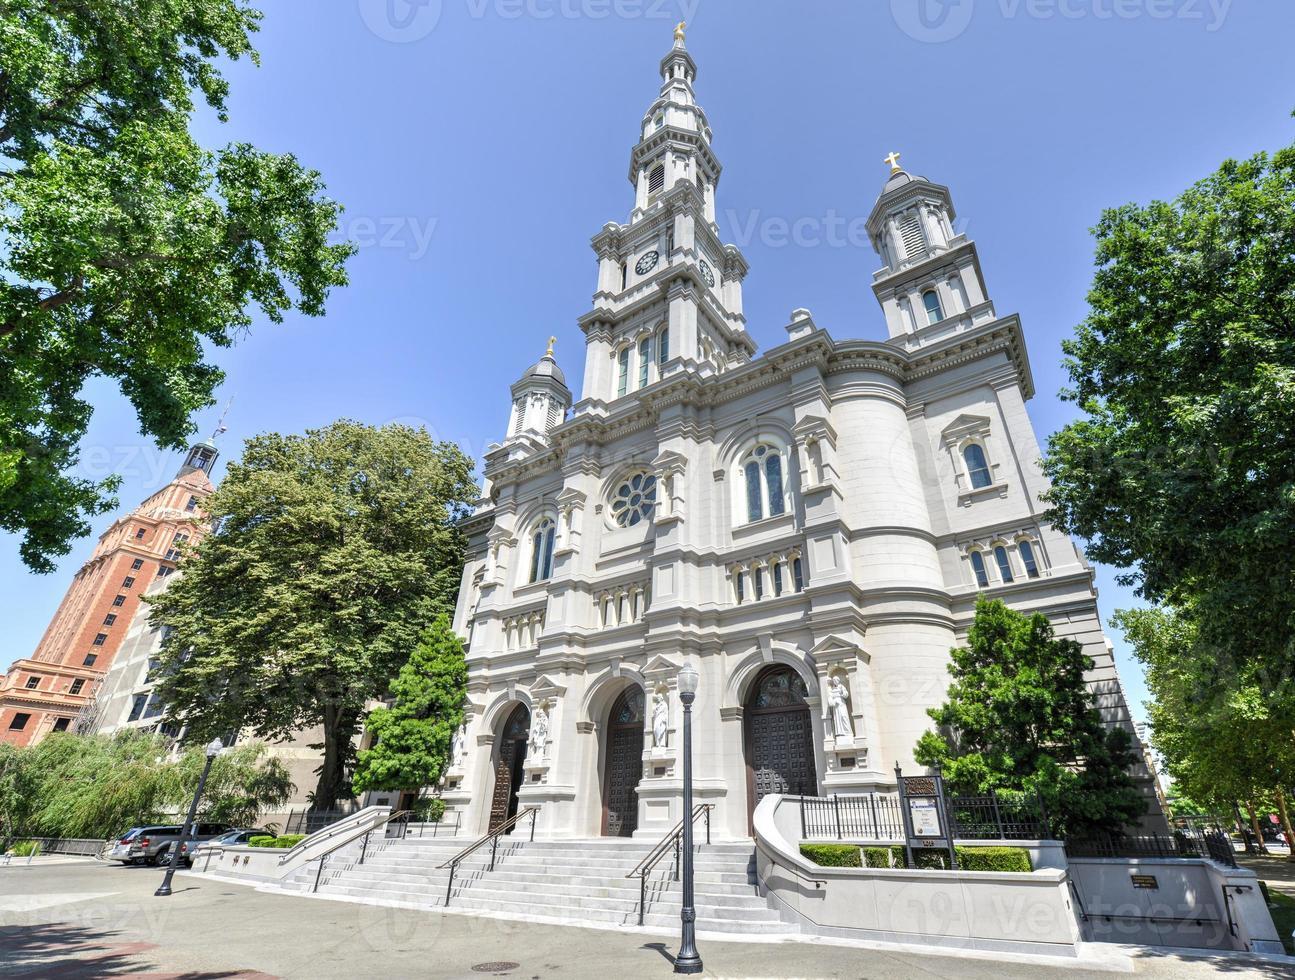 kathedraal van het heilig sacrament, sacramento california foto